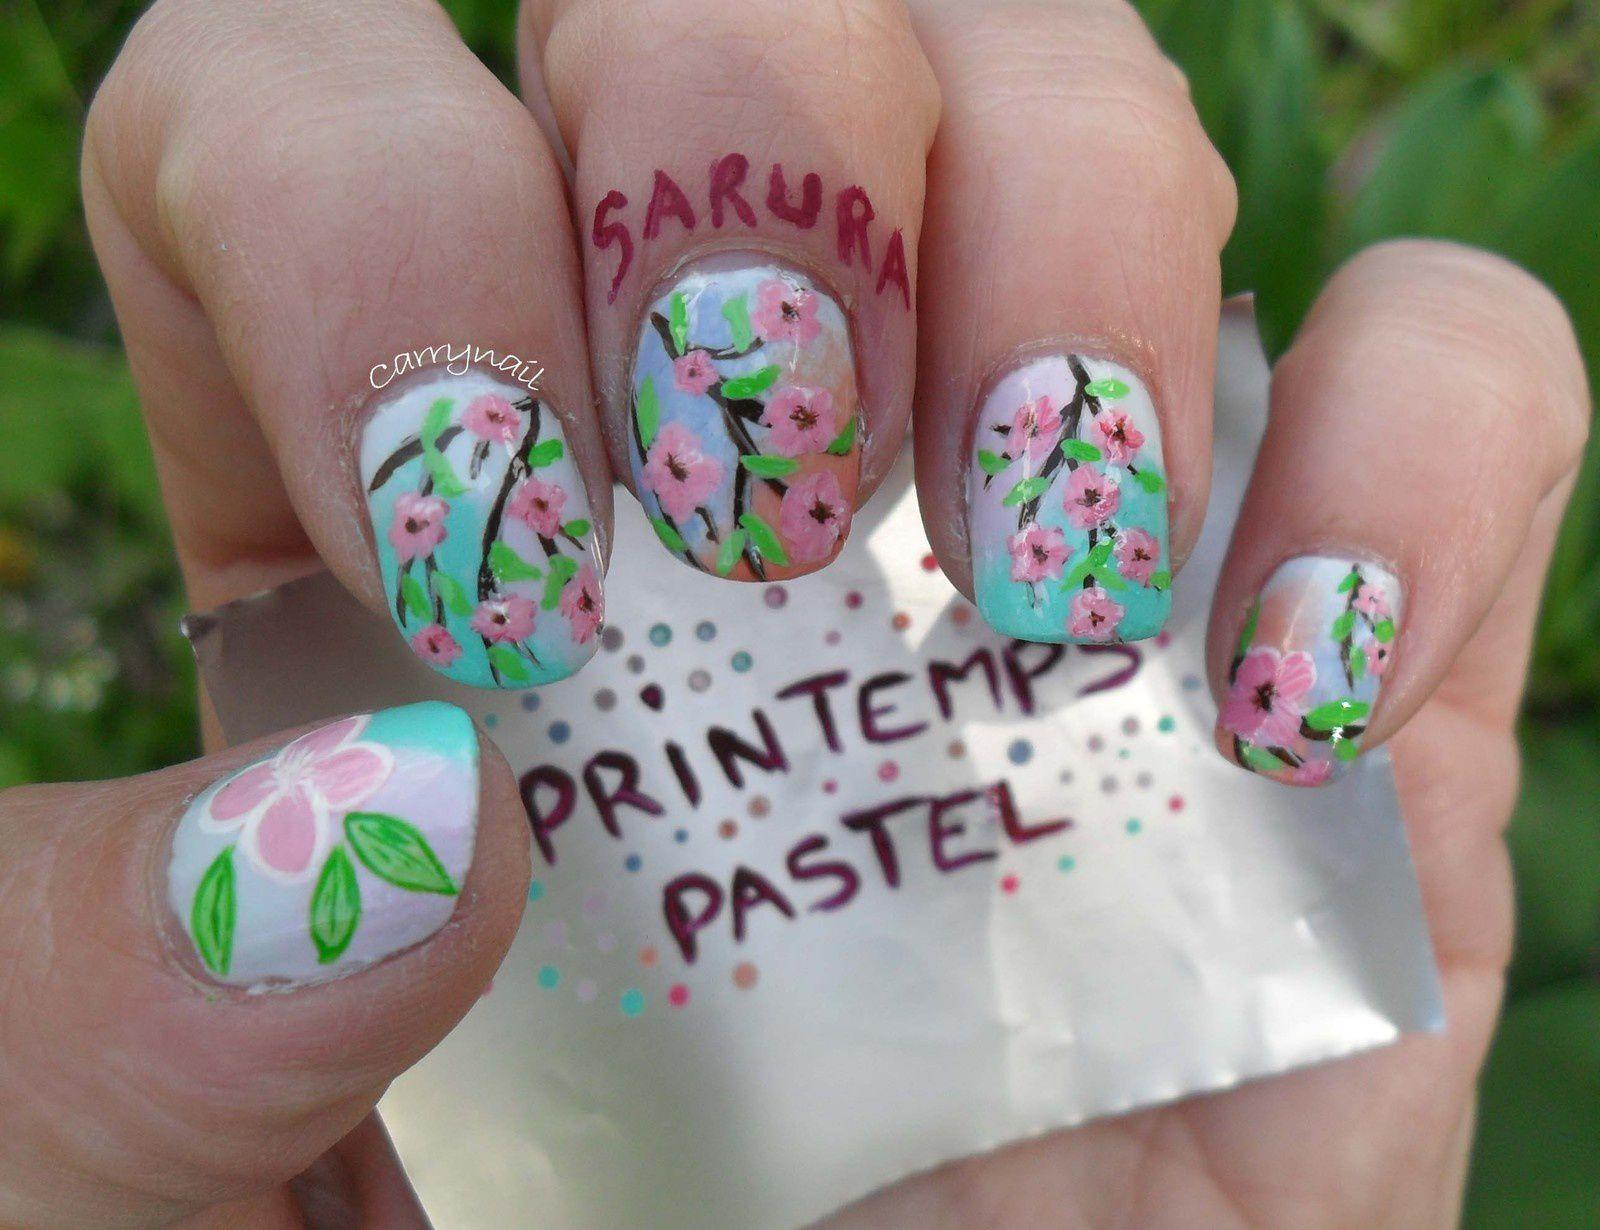 Concours Printemps Pastel de Sakura